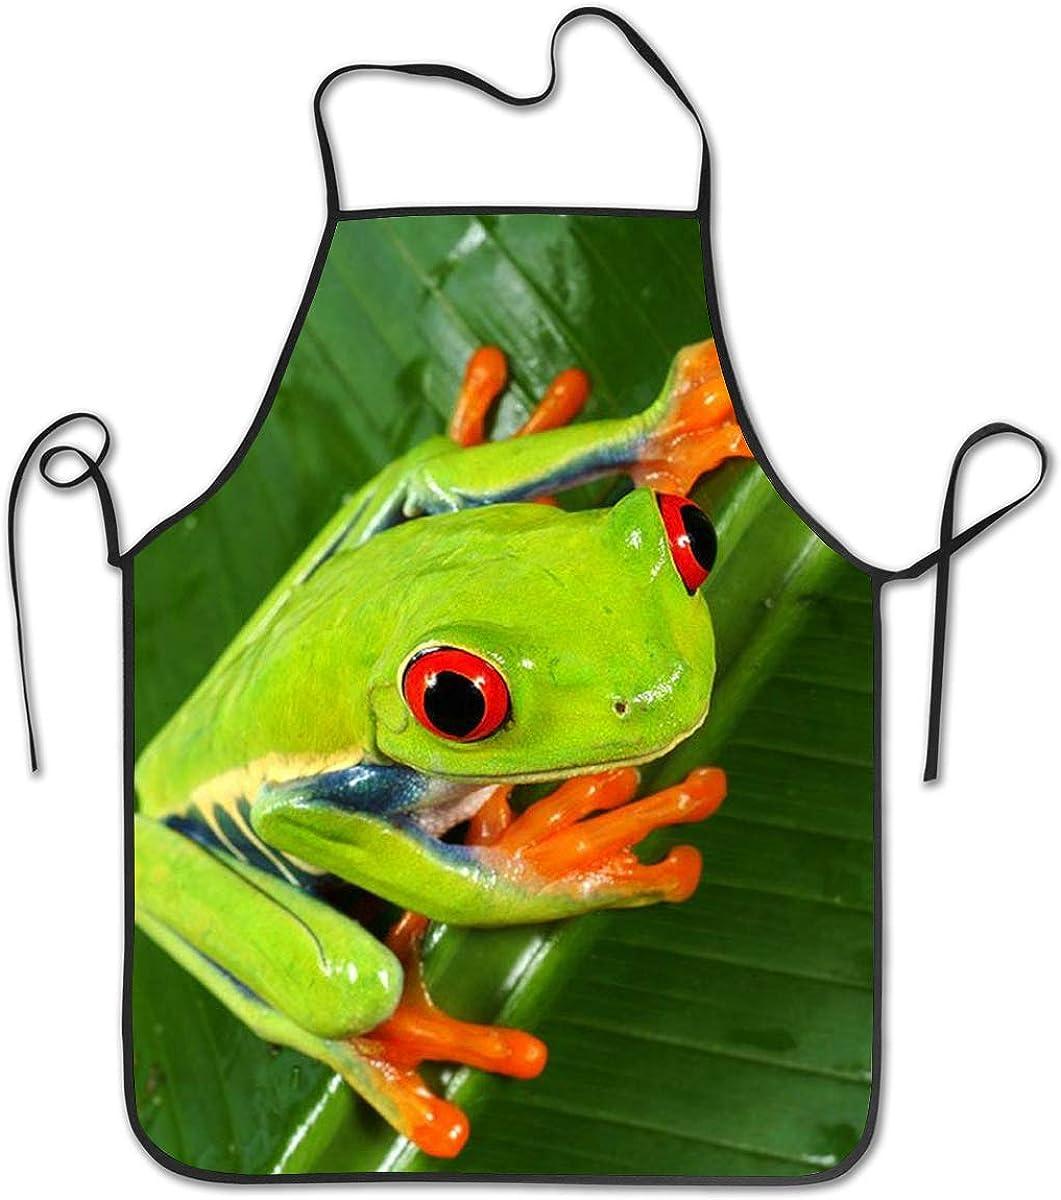 Amazon Com Yellow Eye Green Frog Kitchen Cooking Apron Funny Bib Chef Aprons For Women Men Clothing